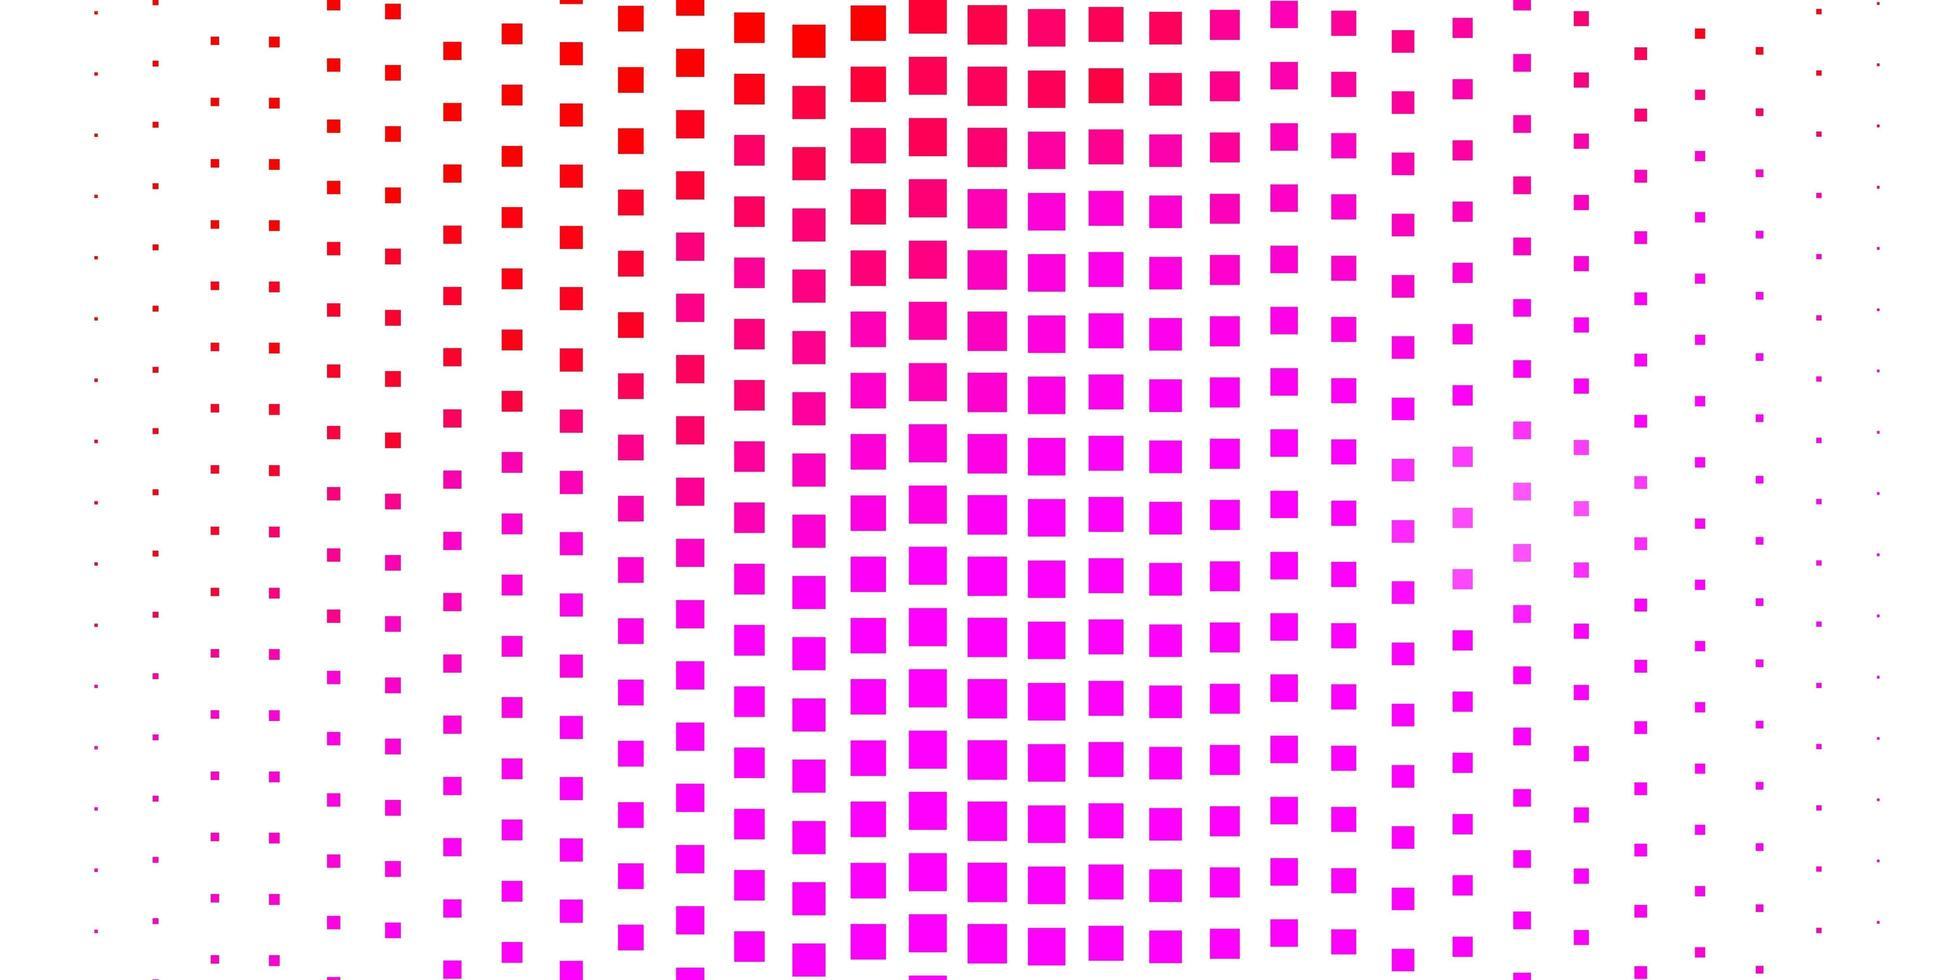 Light Pink texture in rectangular style. vector